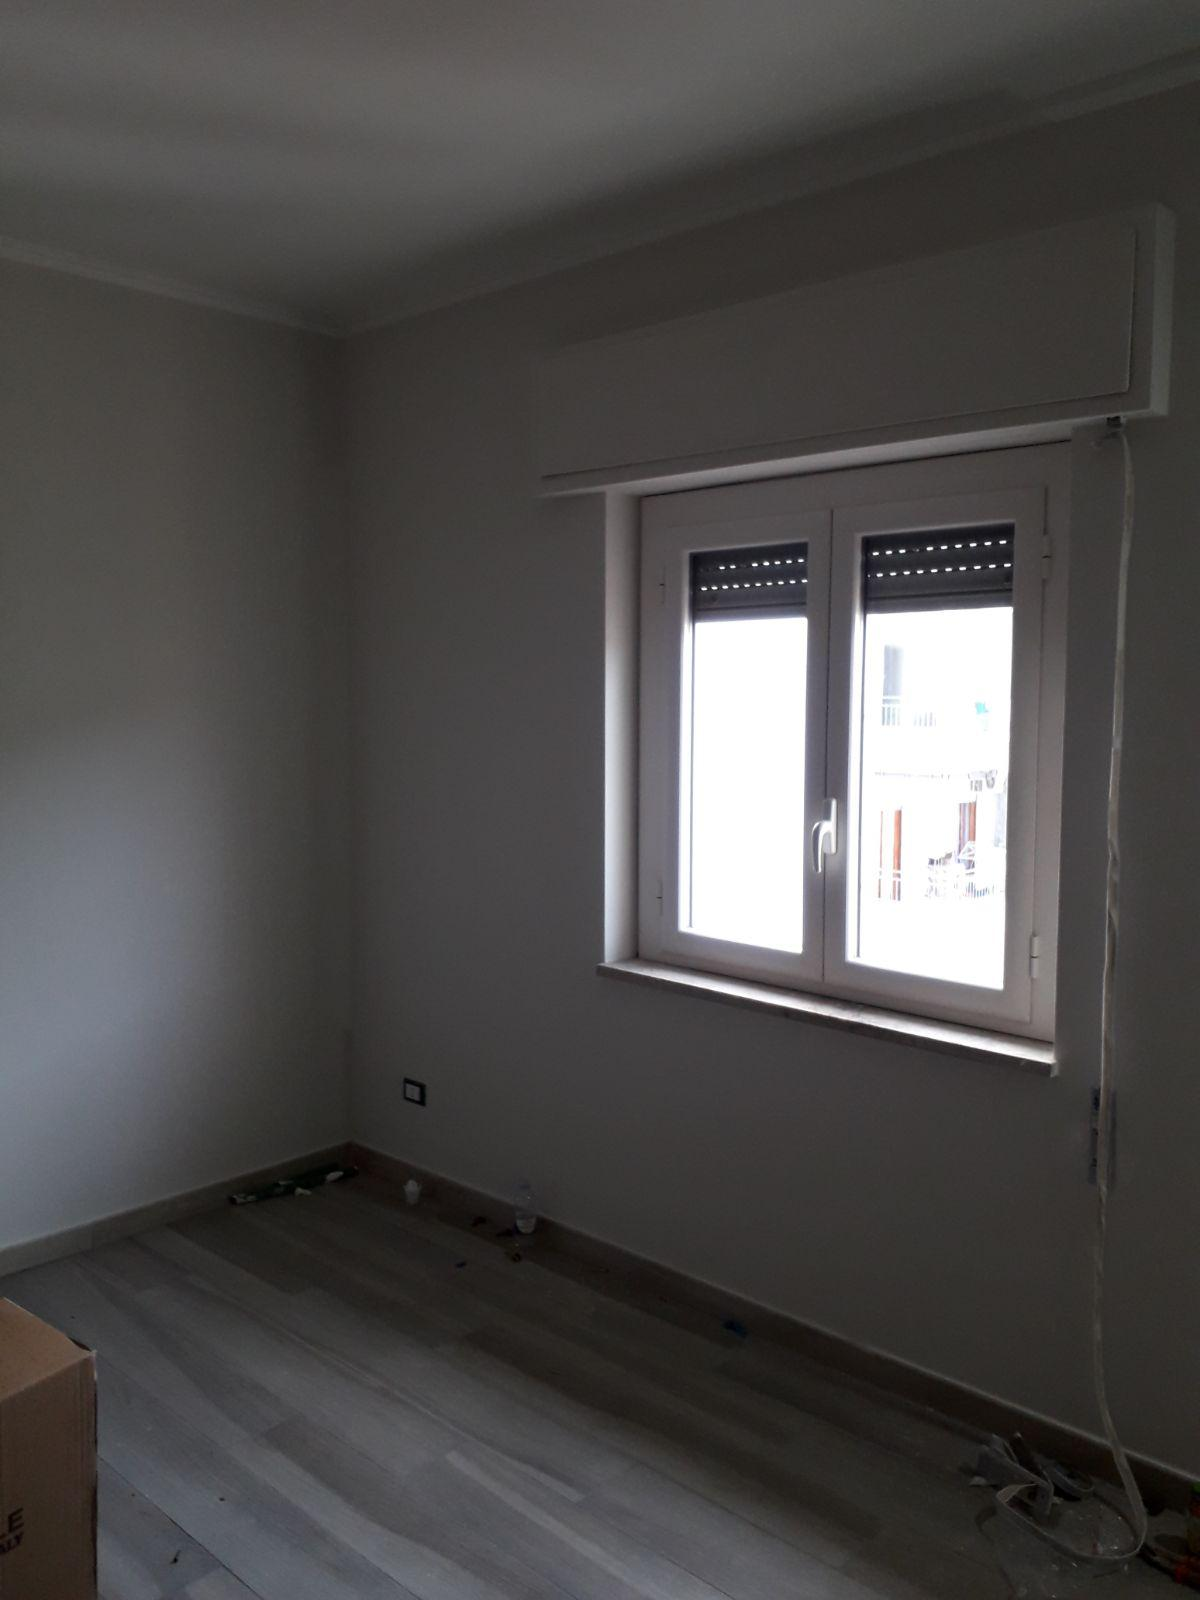 Finestre e porte finestre bagheria palermo - Porte e finestre ostia ...